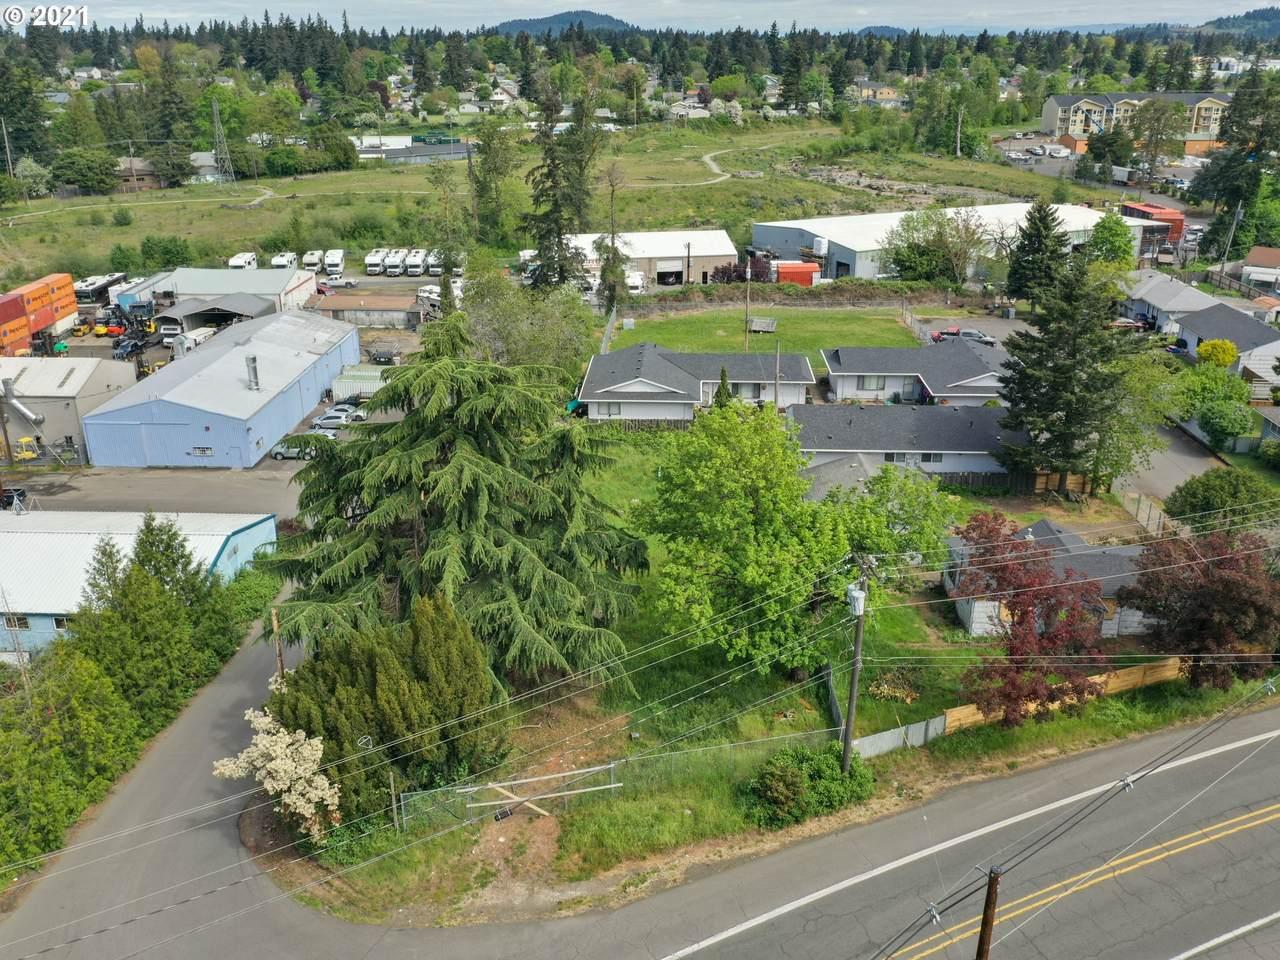 7605 Johnson Creek Blvd - Photo 1